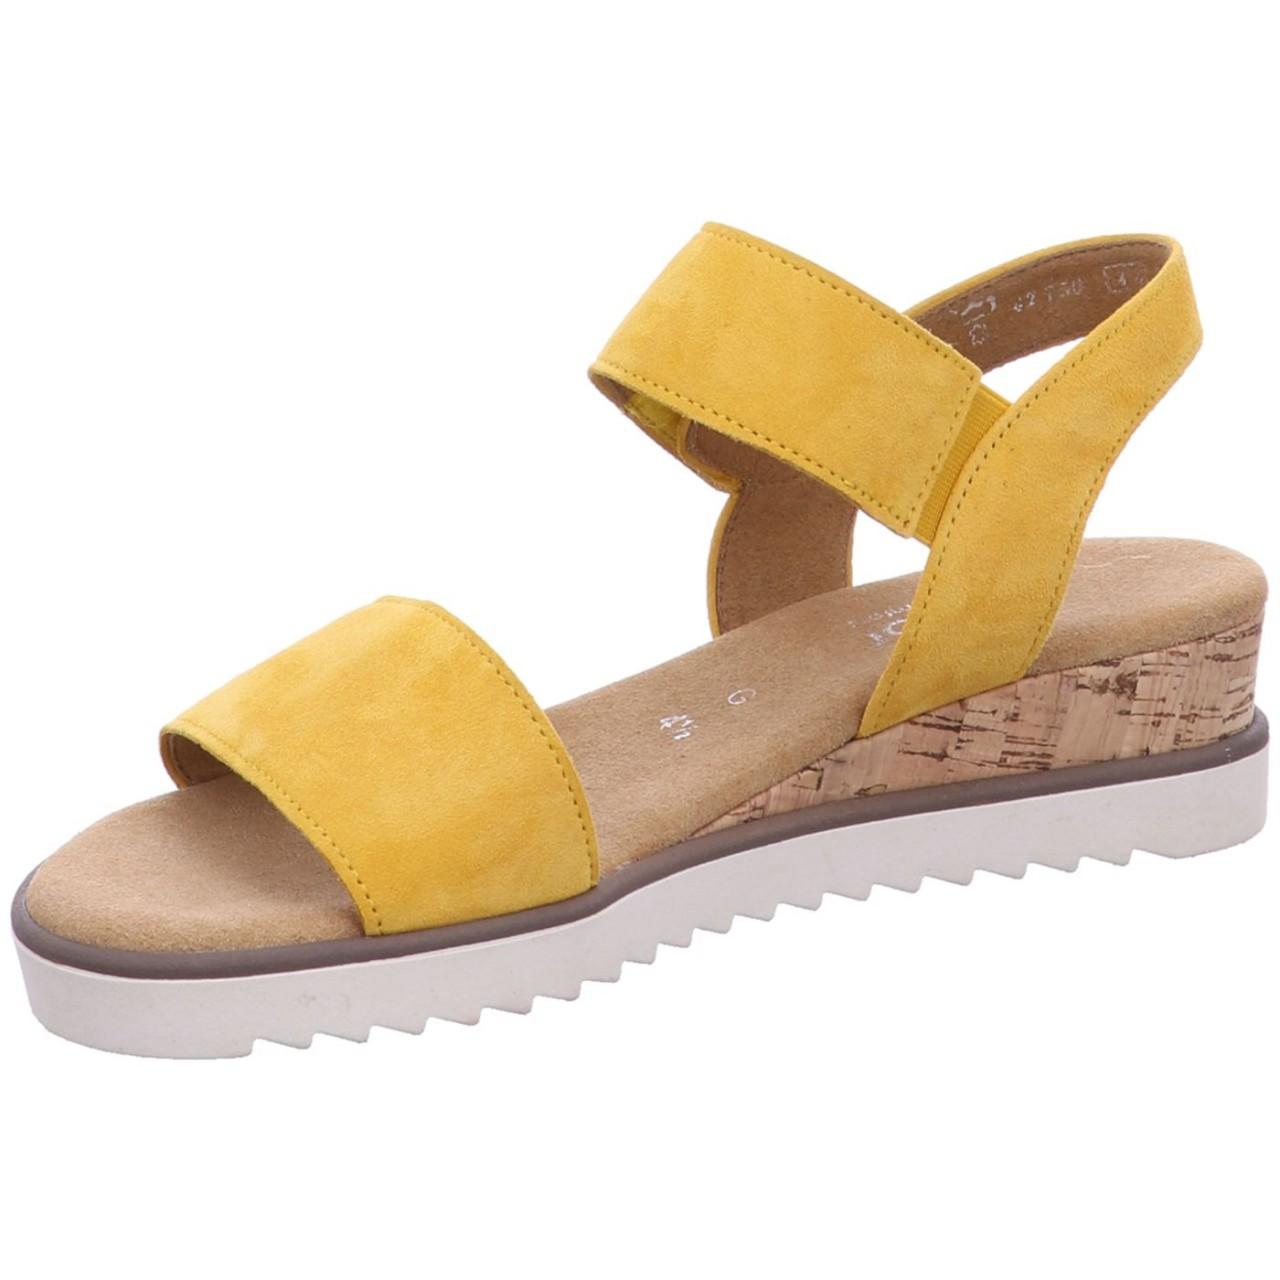 Gabor Sandale 62.750-22 Gelb mango (Kork/creme) 22 62.750-22